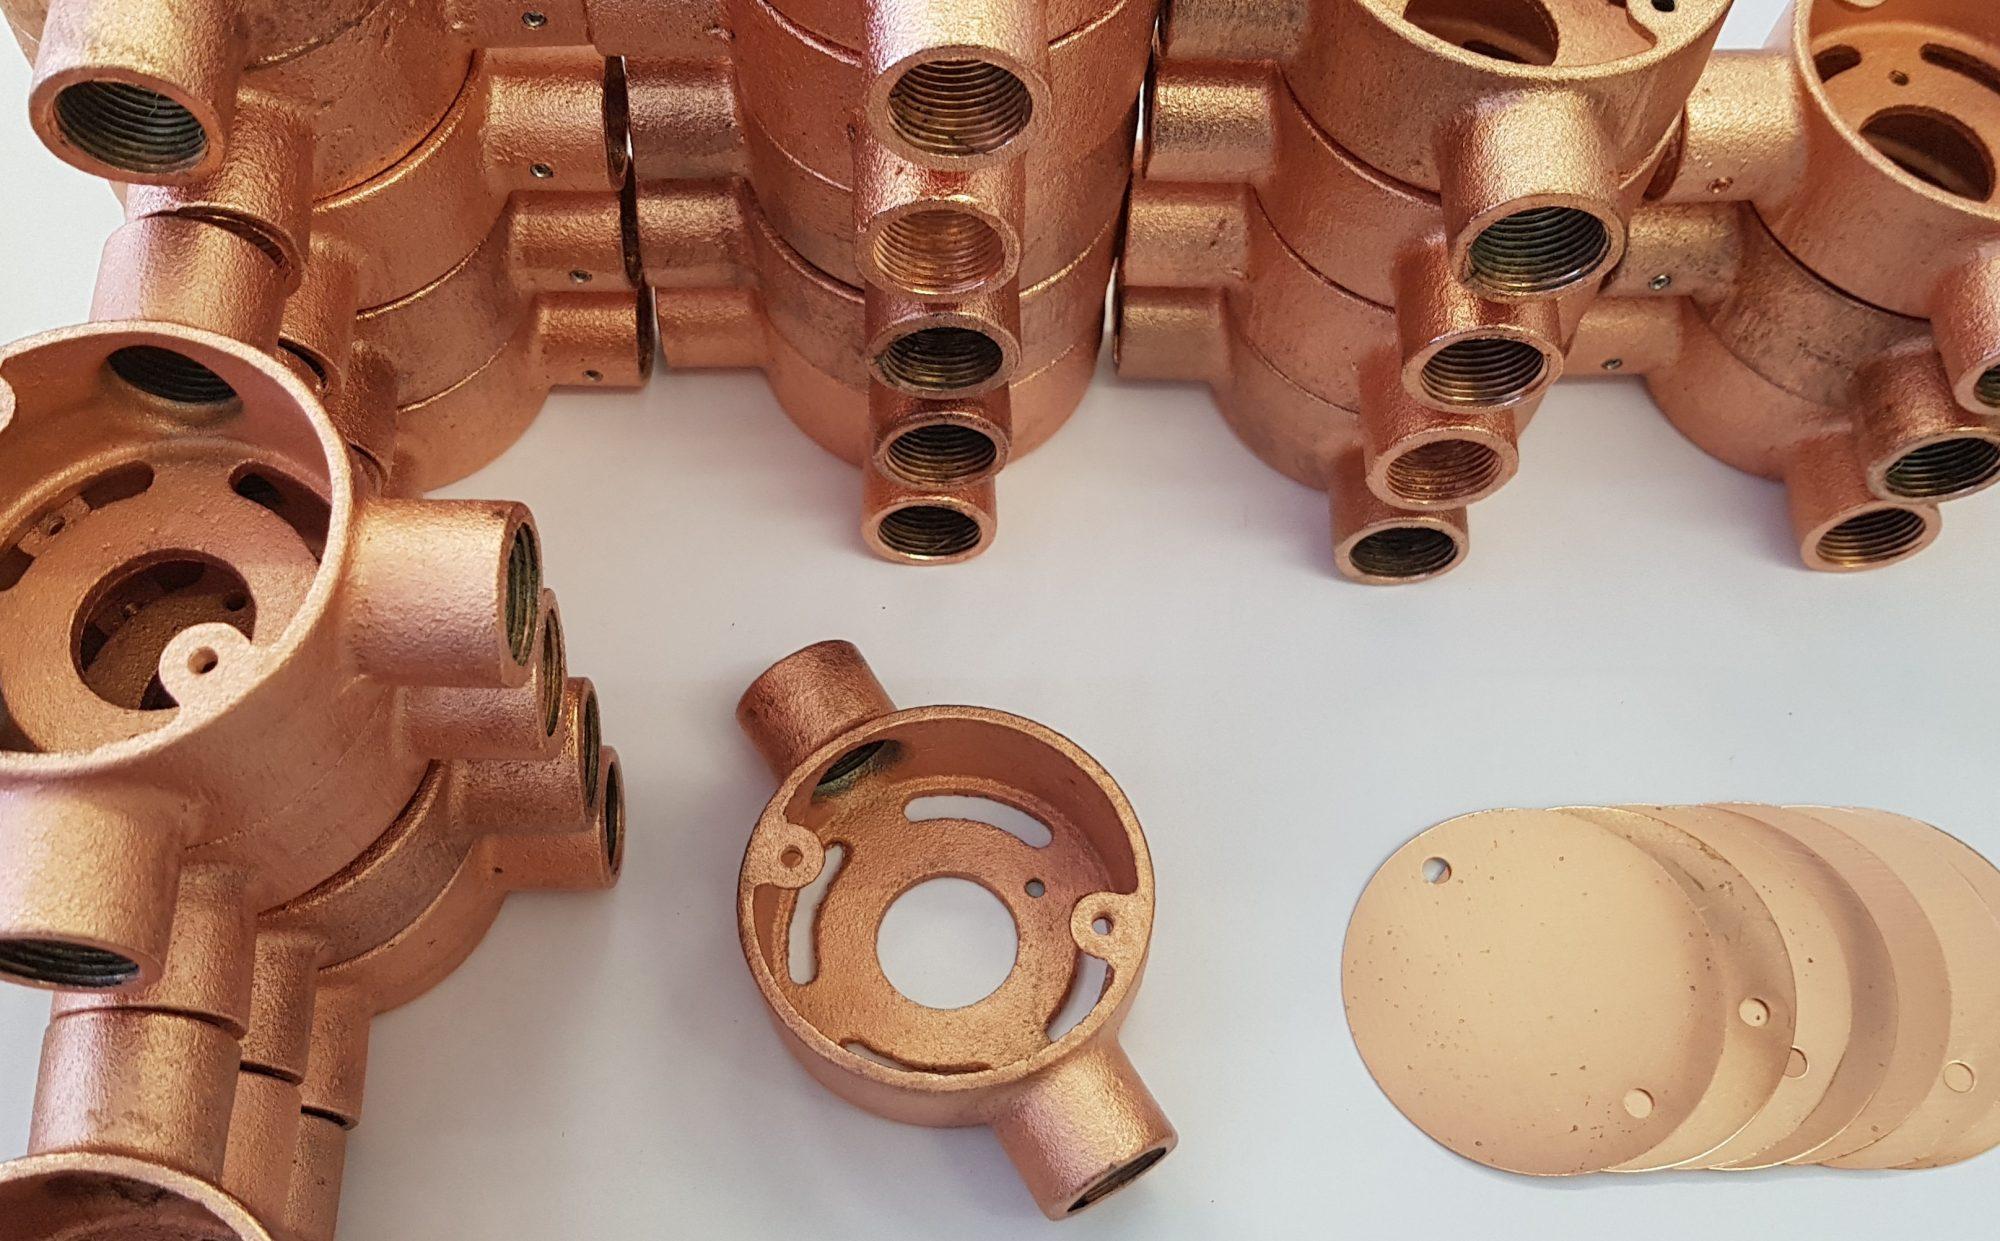 Conduit lighting - Copper conduit